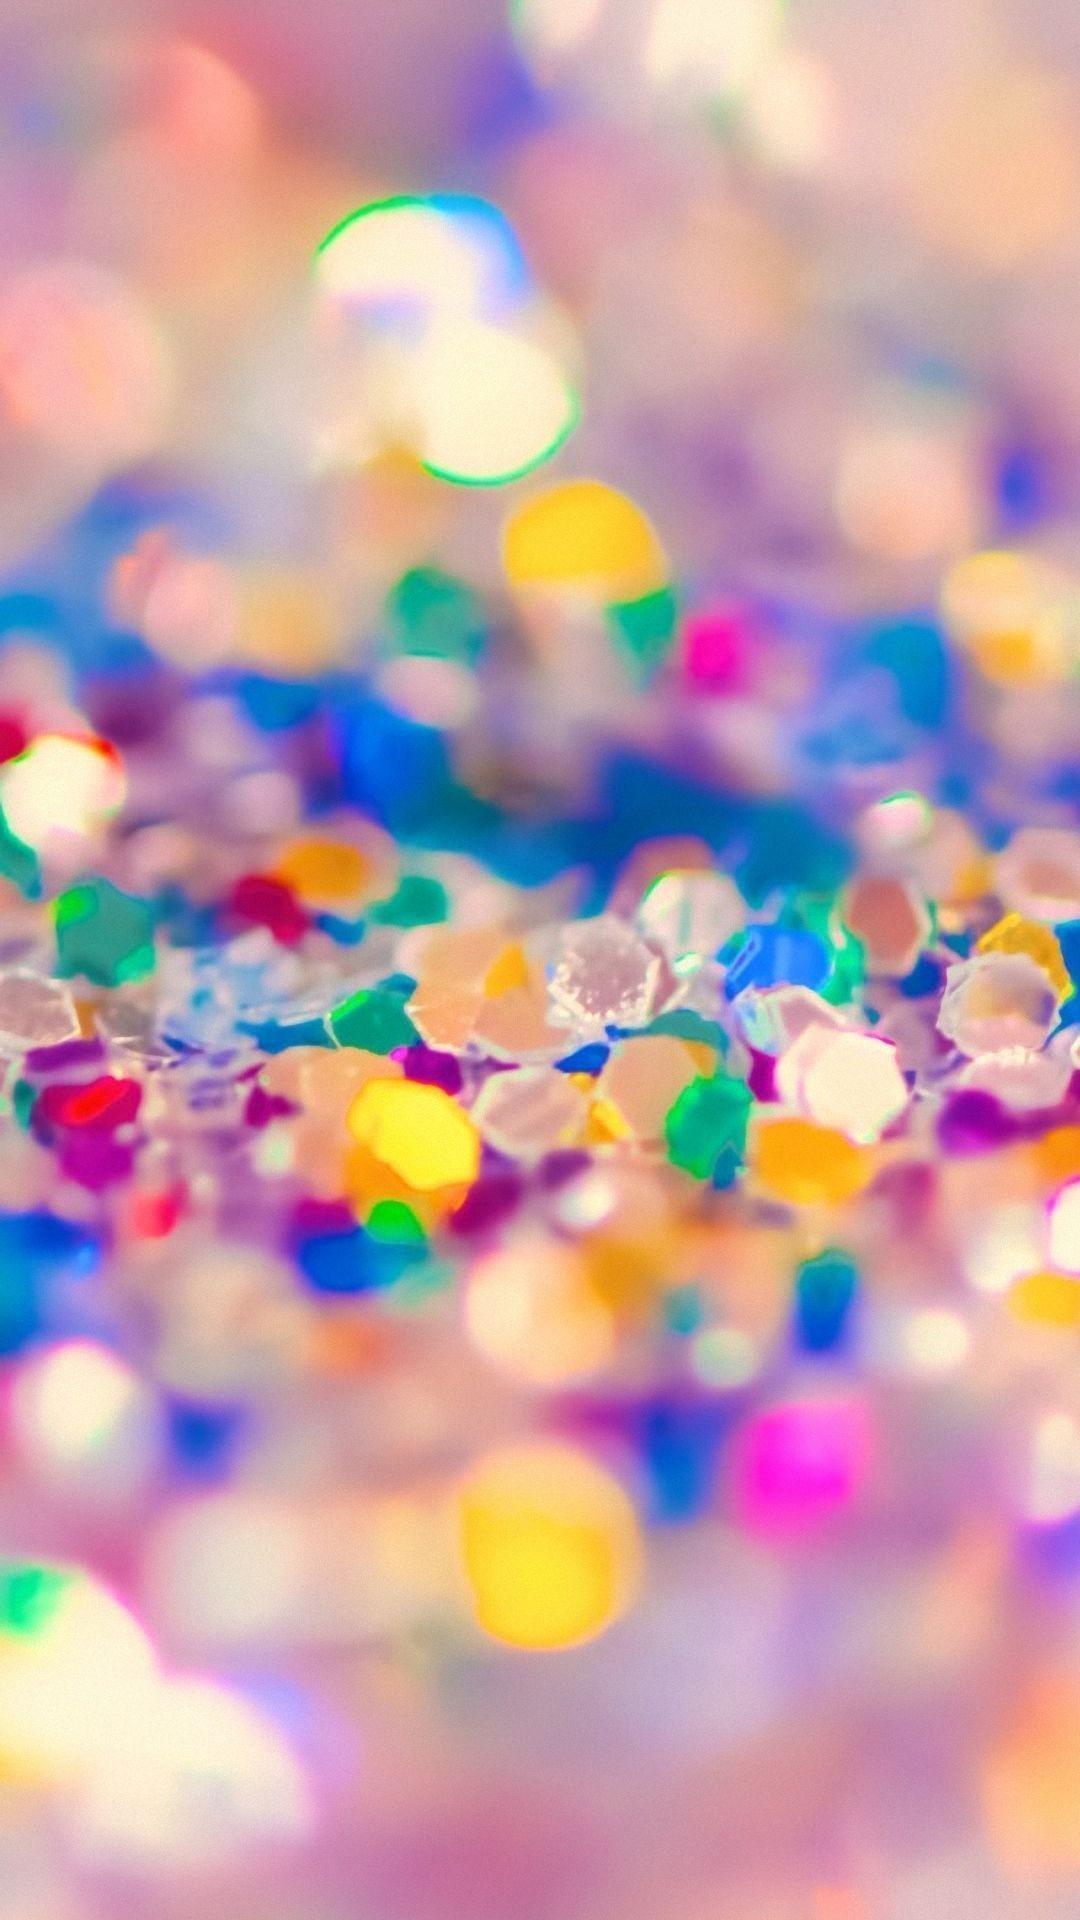 Hd wallpaper samsung - Colorful Glitter Samsung Galaxy A7 Wallpapers Hd 1080x1920